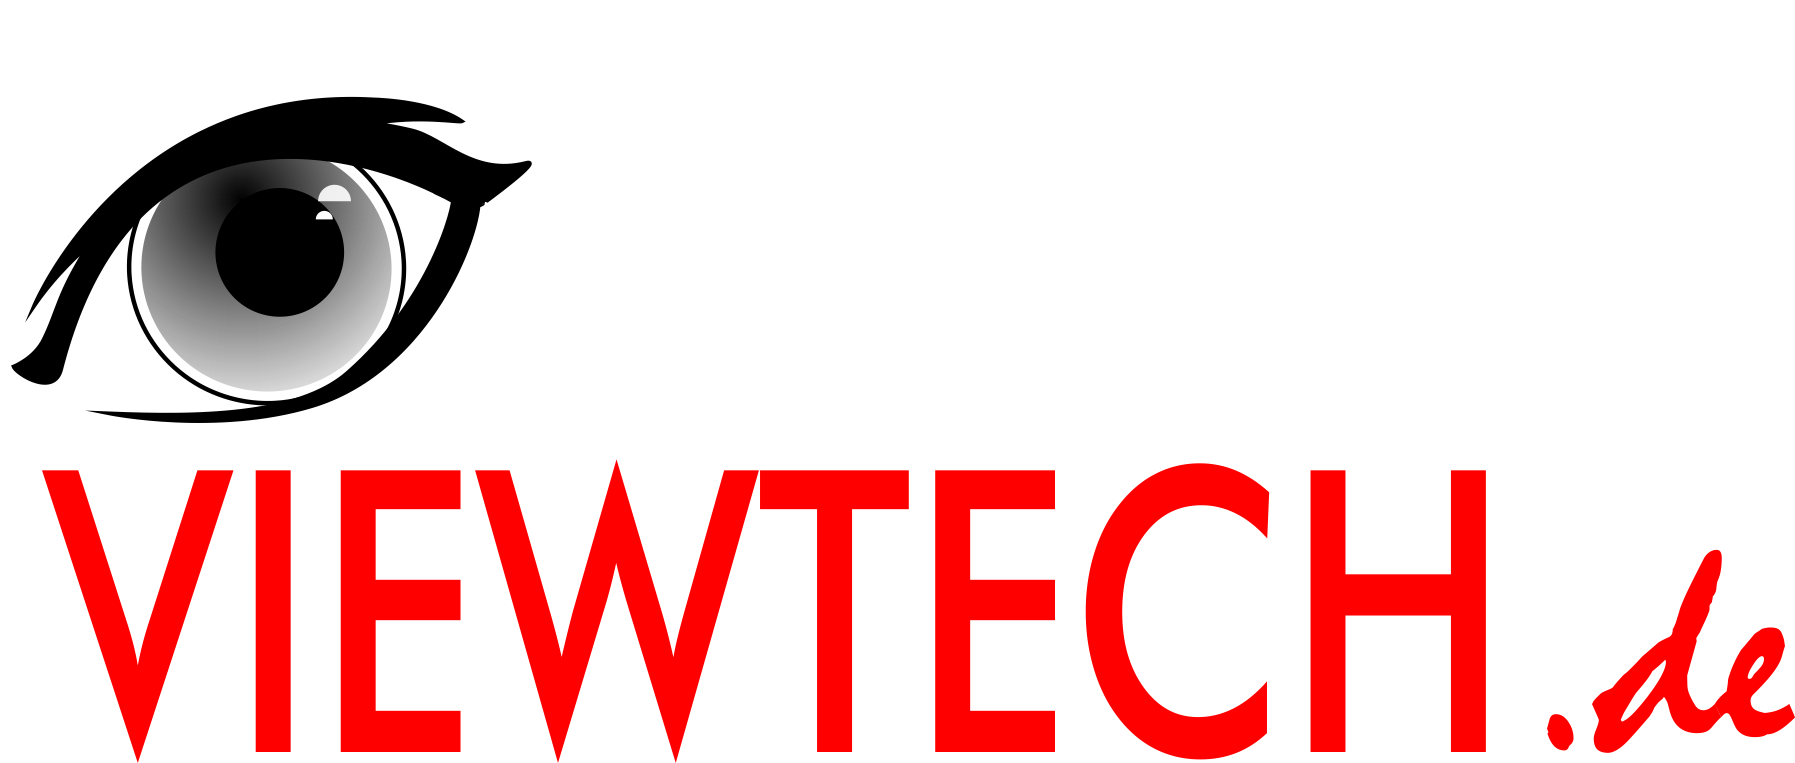 Viewtech